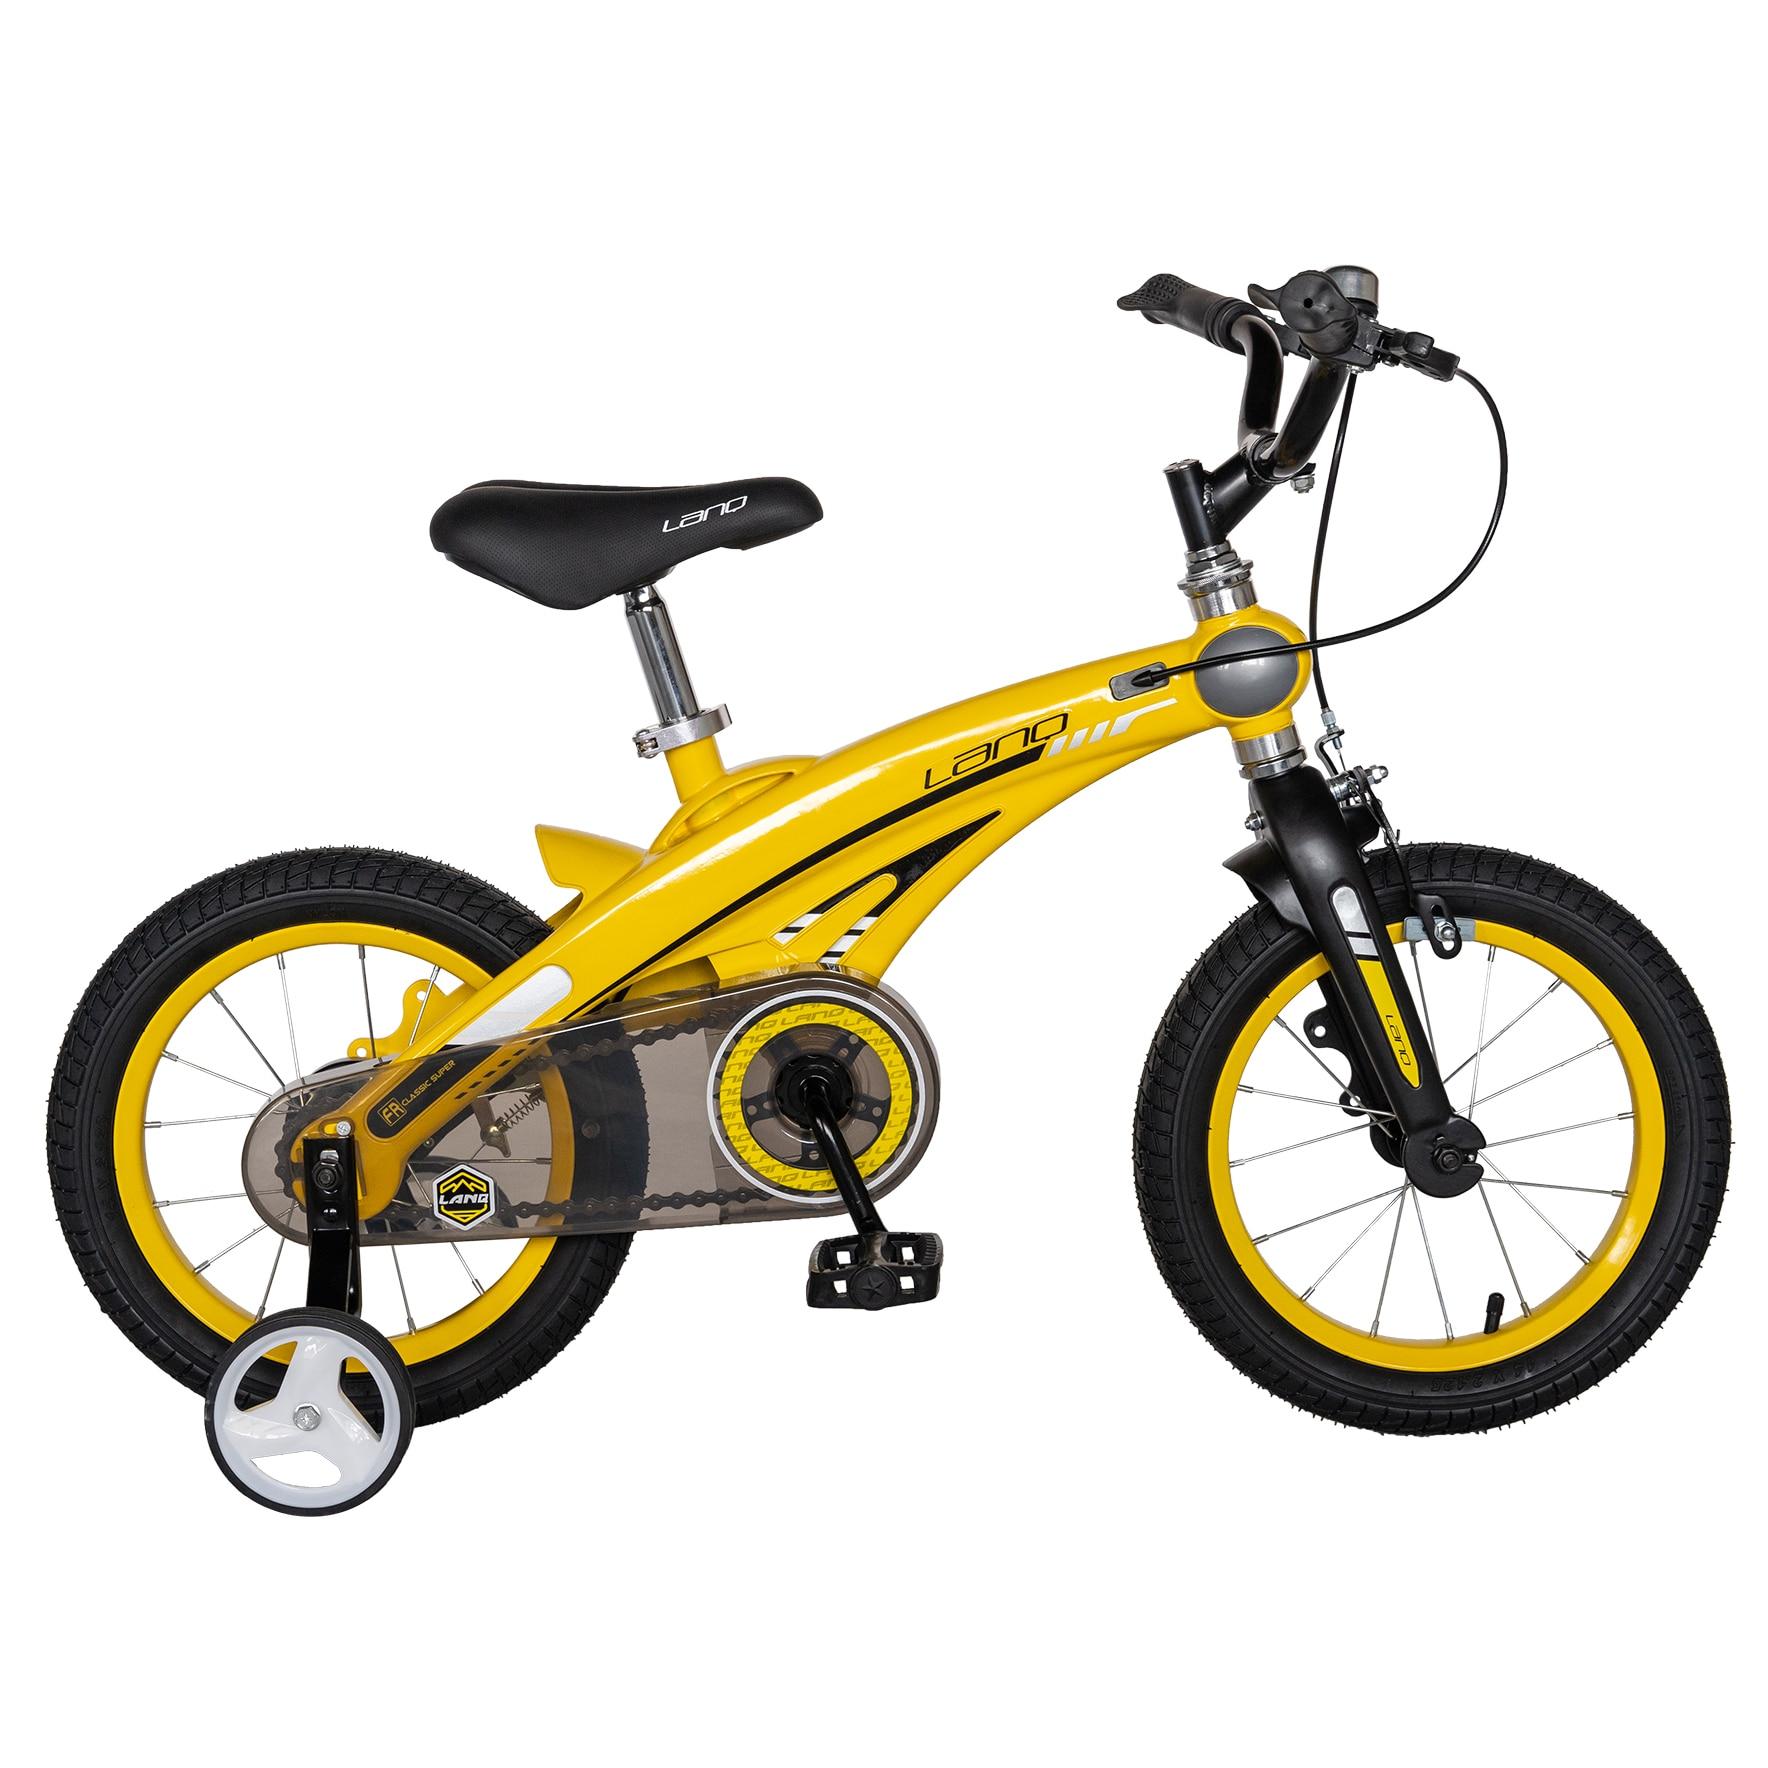 "Fotografie Bicicleta copii Lanq W1439D, roata 14"", cadru aliaj magneziu, frana C-Brake, roti ajutatoare, 3-5 ani, galben/negru"